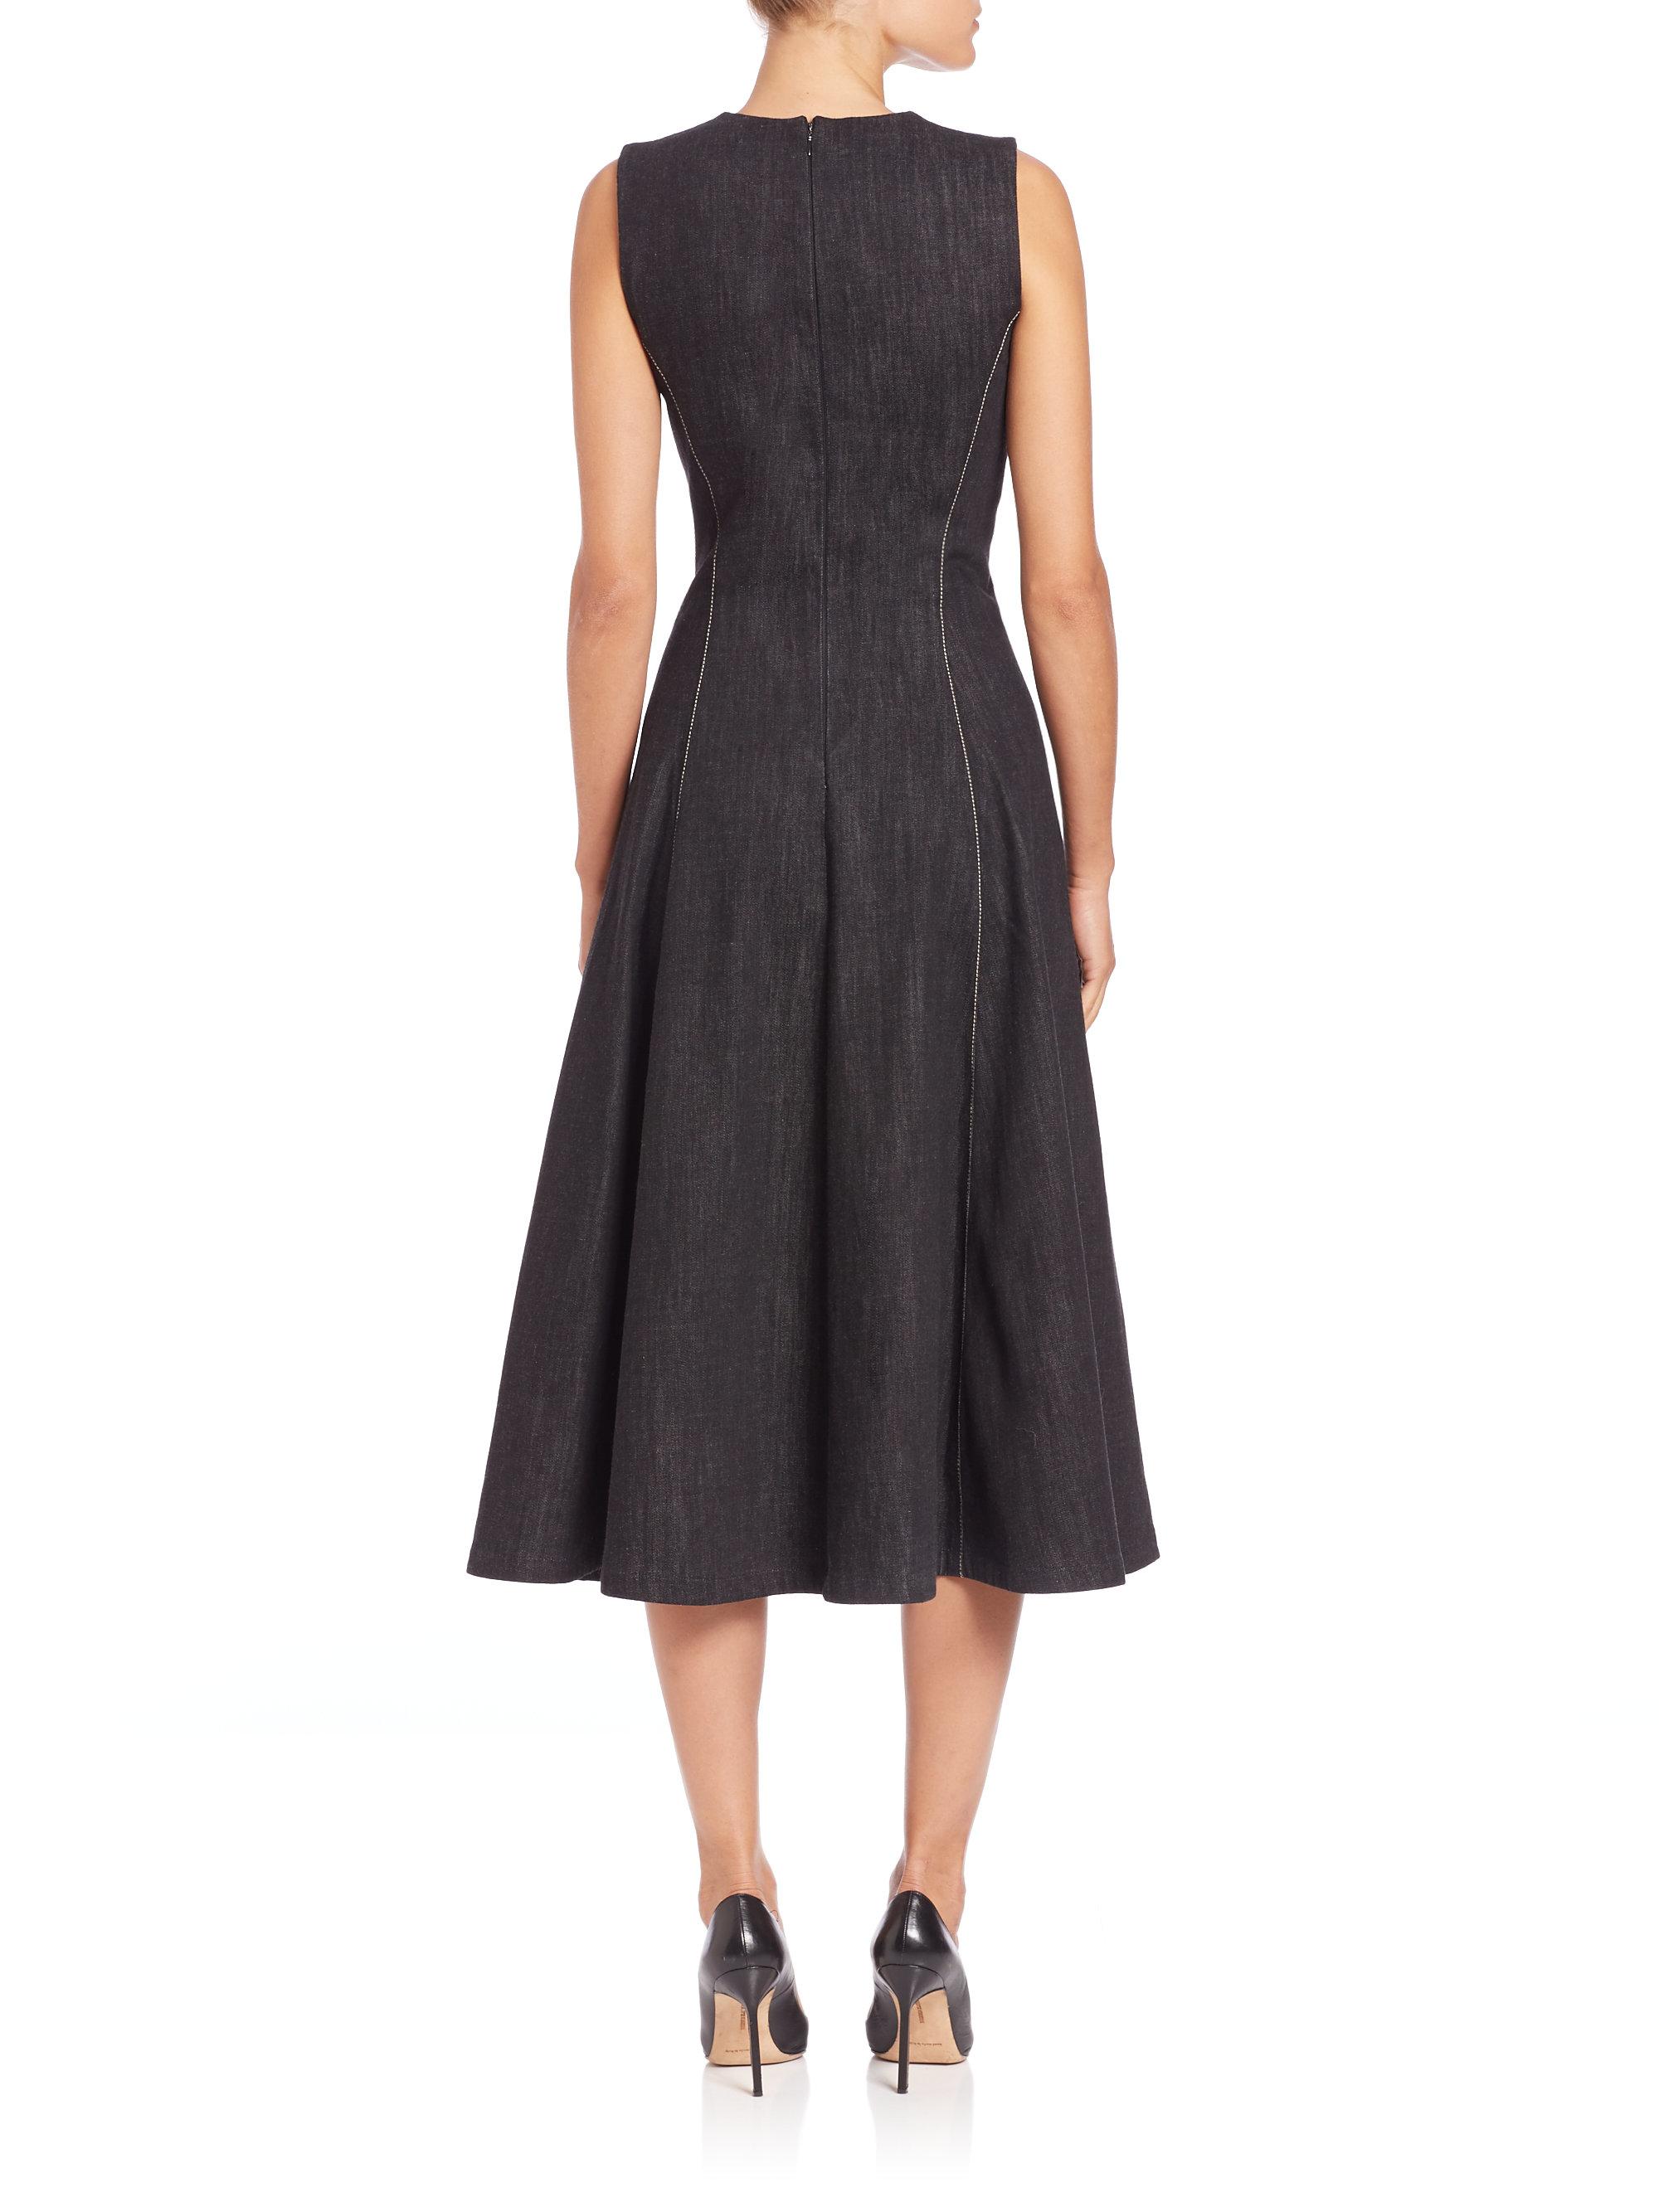 Lyst - Ralph Lauren Collection Pauline Denim Fit-&-flare Dress in Black